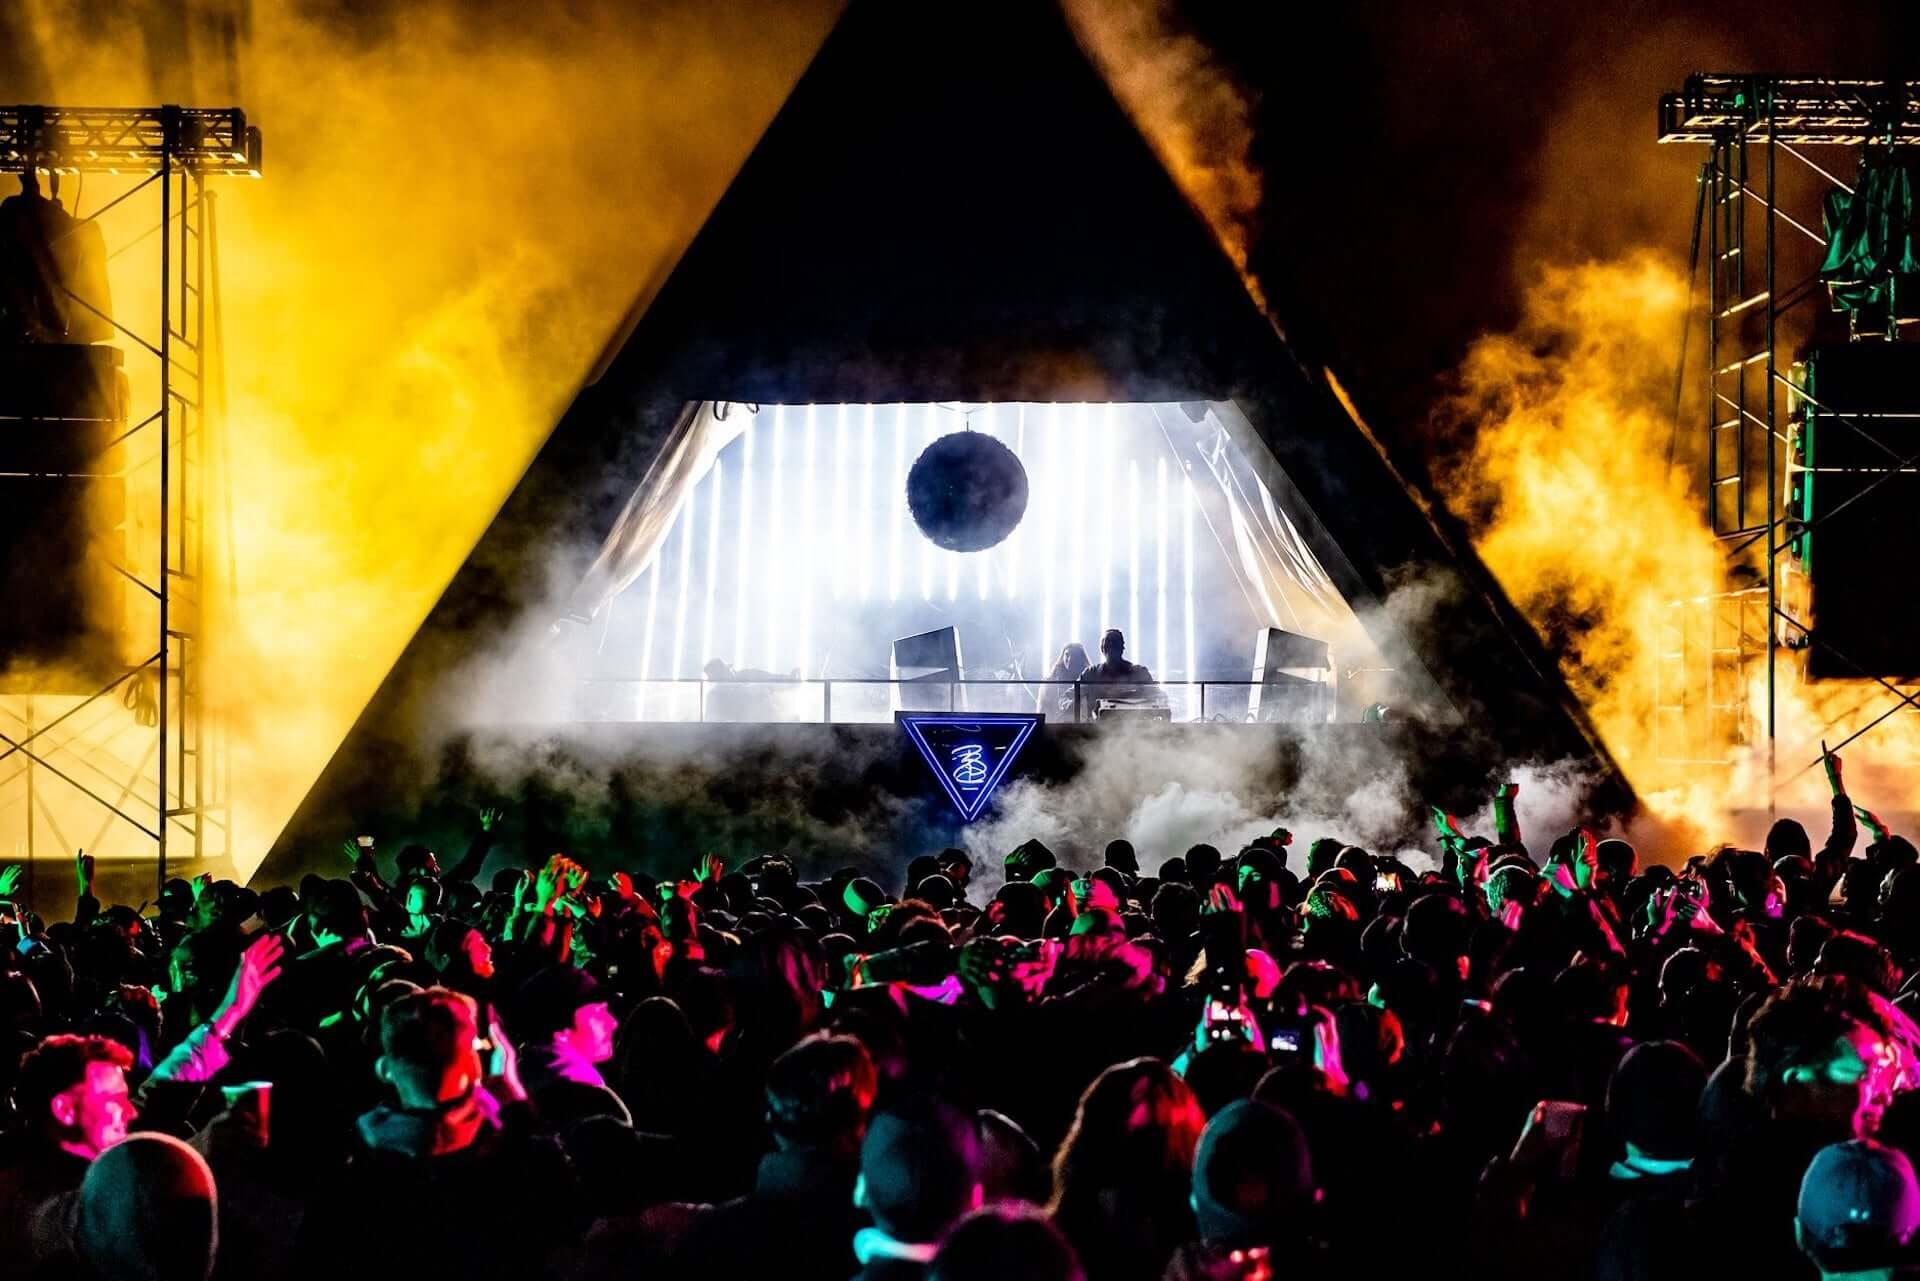 <RAINBOW DISCO CLUB>が12時間ノンストップ動画配信イベントを開催!DJ Nobu、Licaxxx、Yoshinori Hayashi、CYKらが出演 music200327_rainbow_disco_club_1-1920x1281